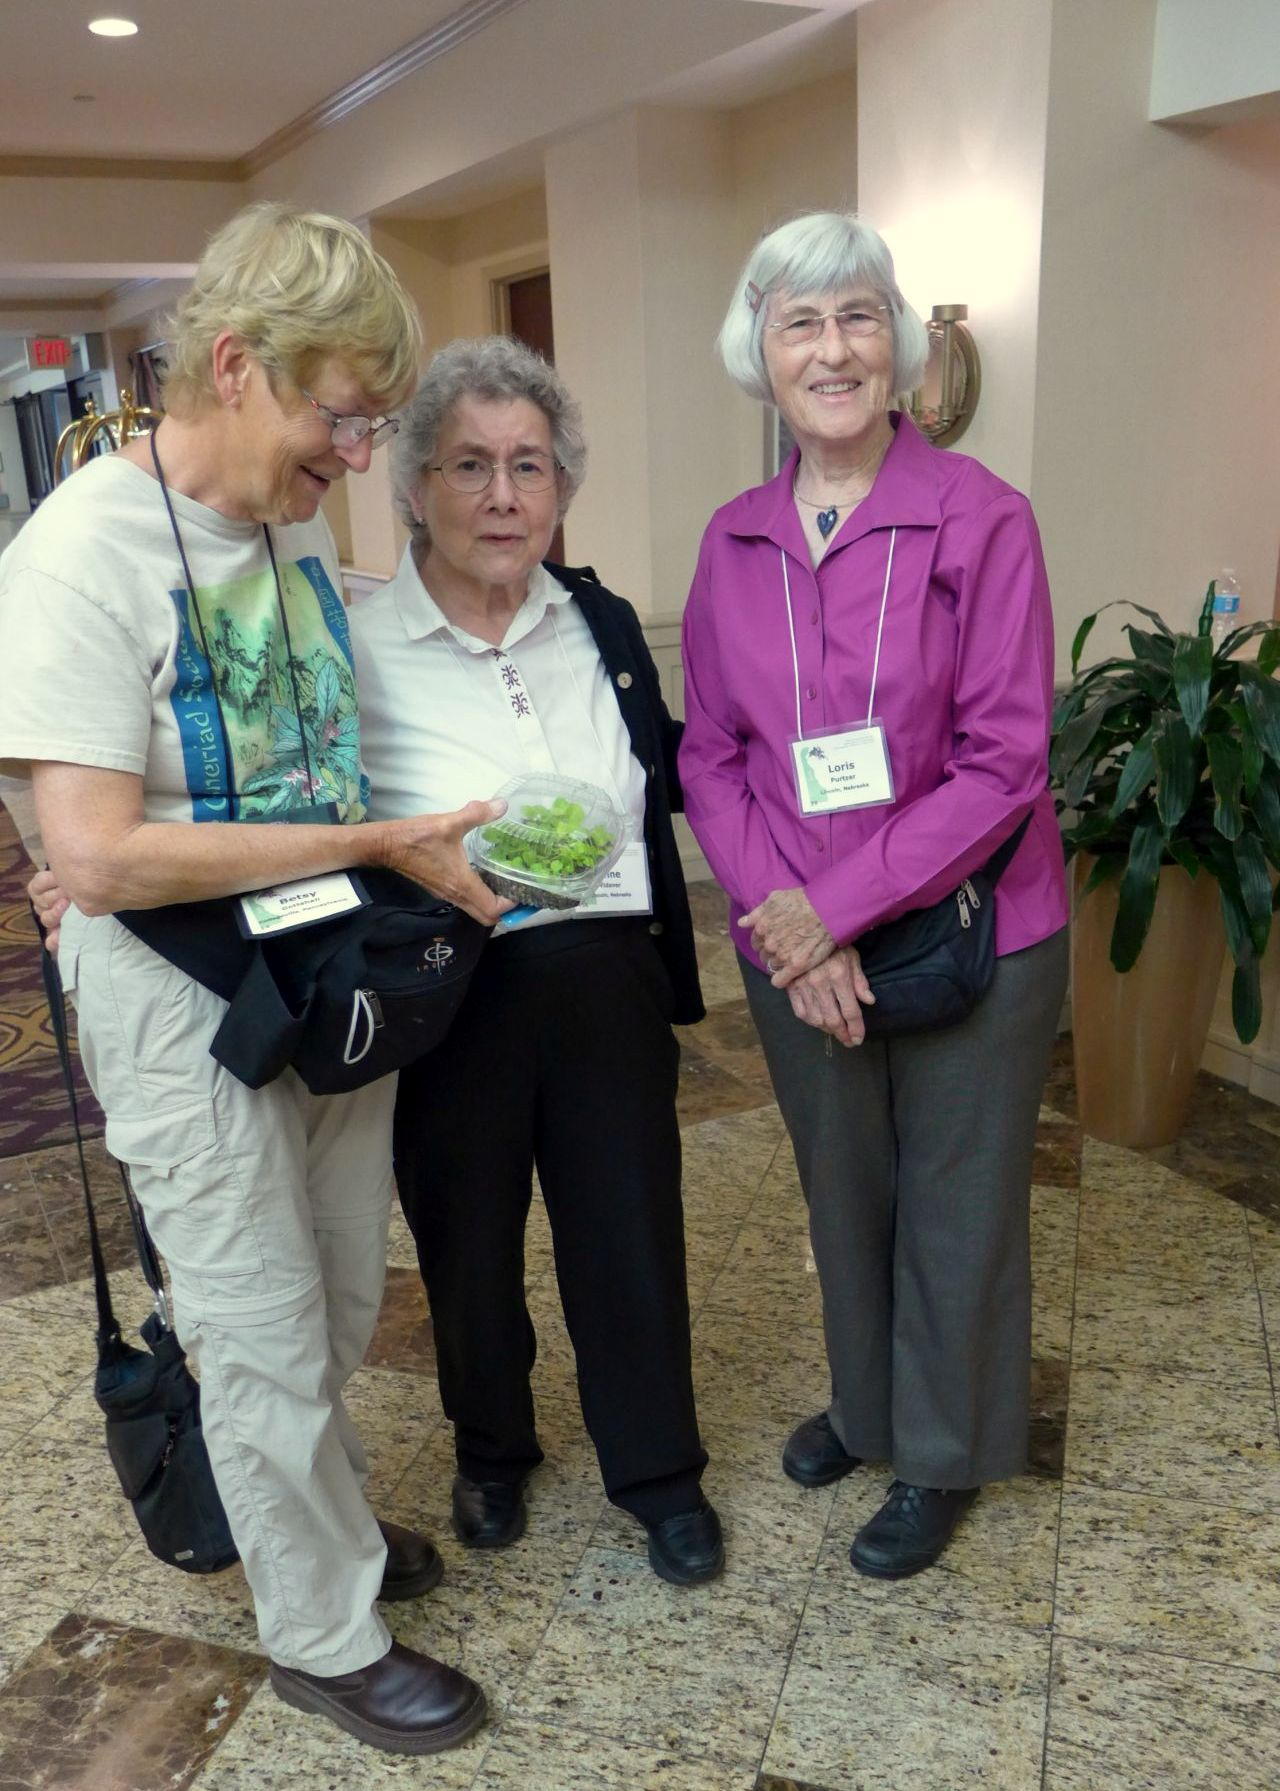 Betsy Gottshall, Anne Vidaver and Loris Purtzer